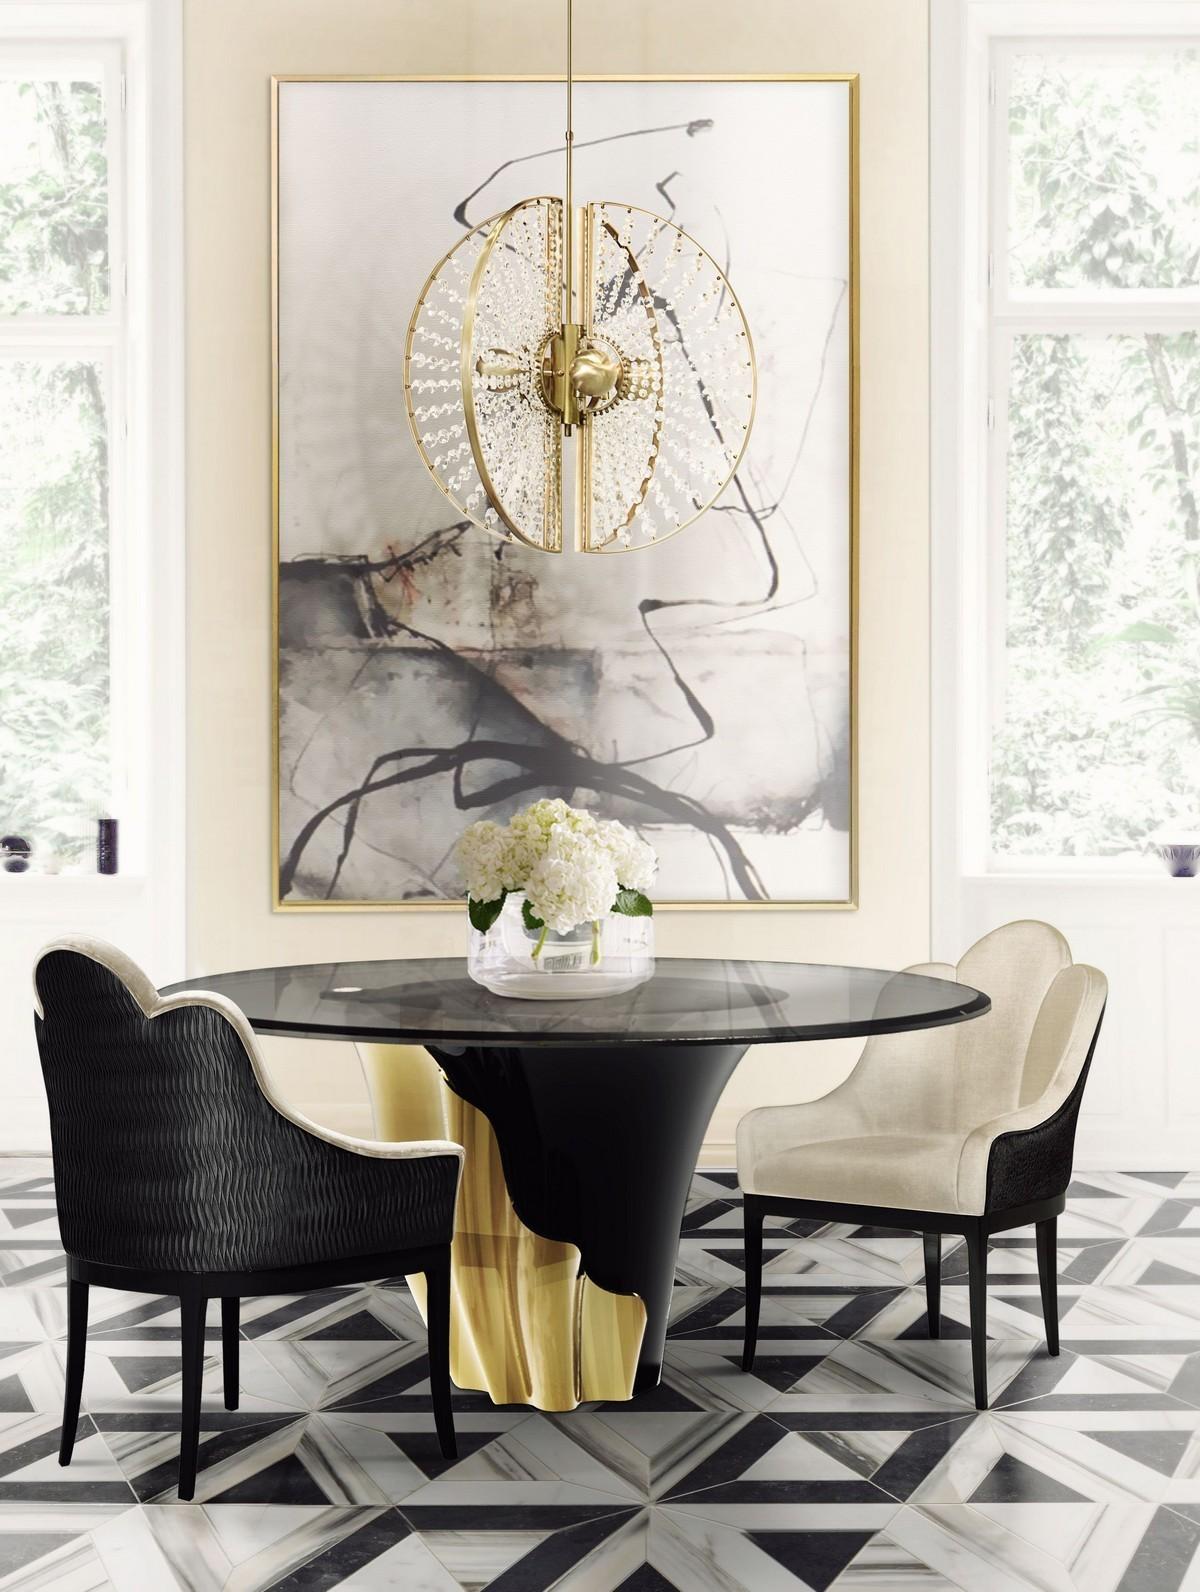 Top Minimalist Dining Chairs minimalist dining chairs Top Minimalist Dining Chairs anastasia